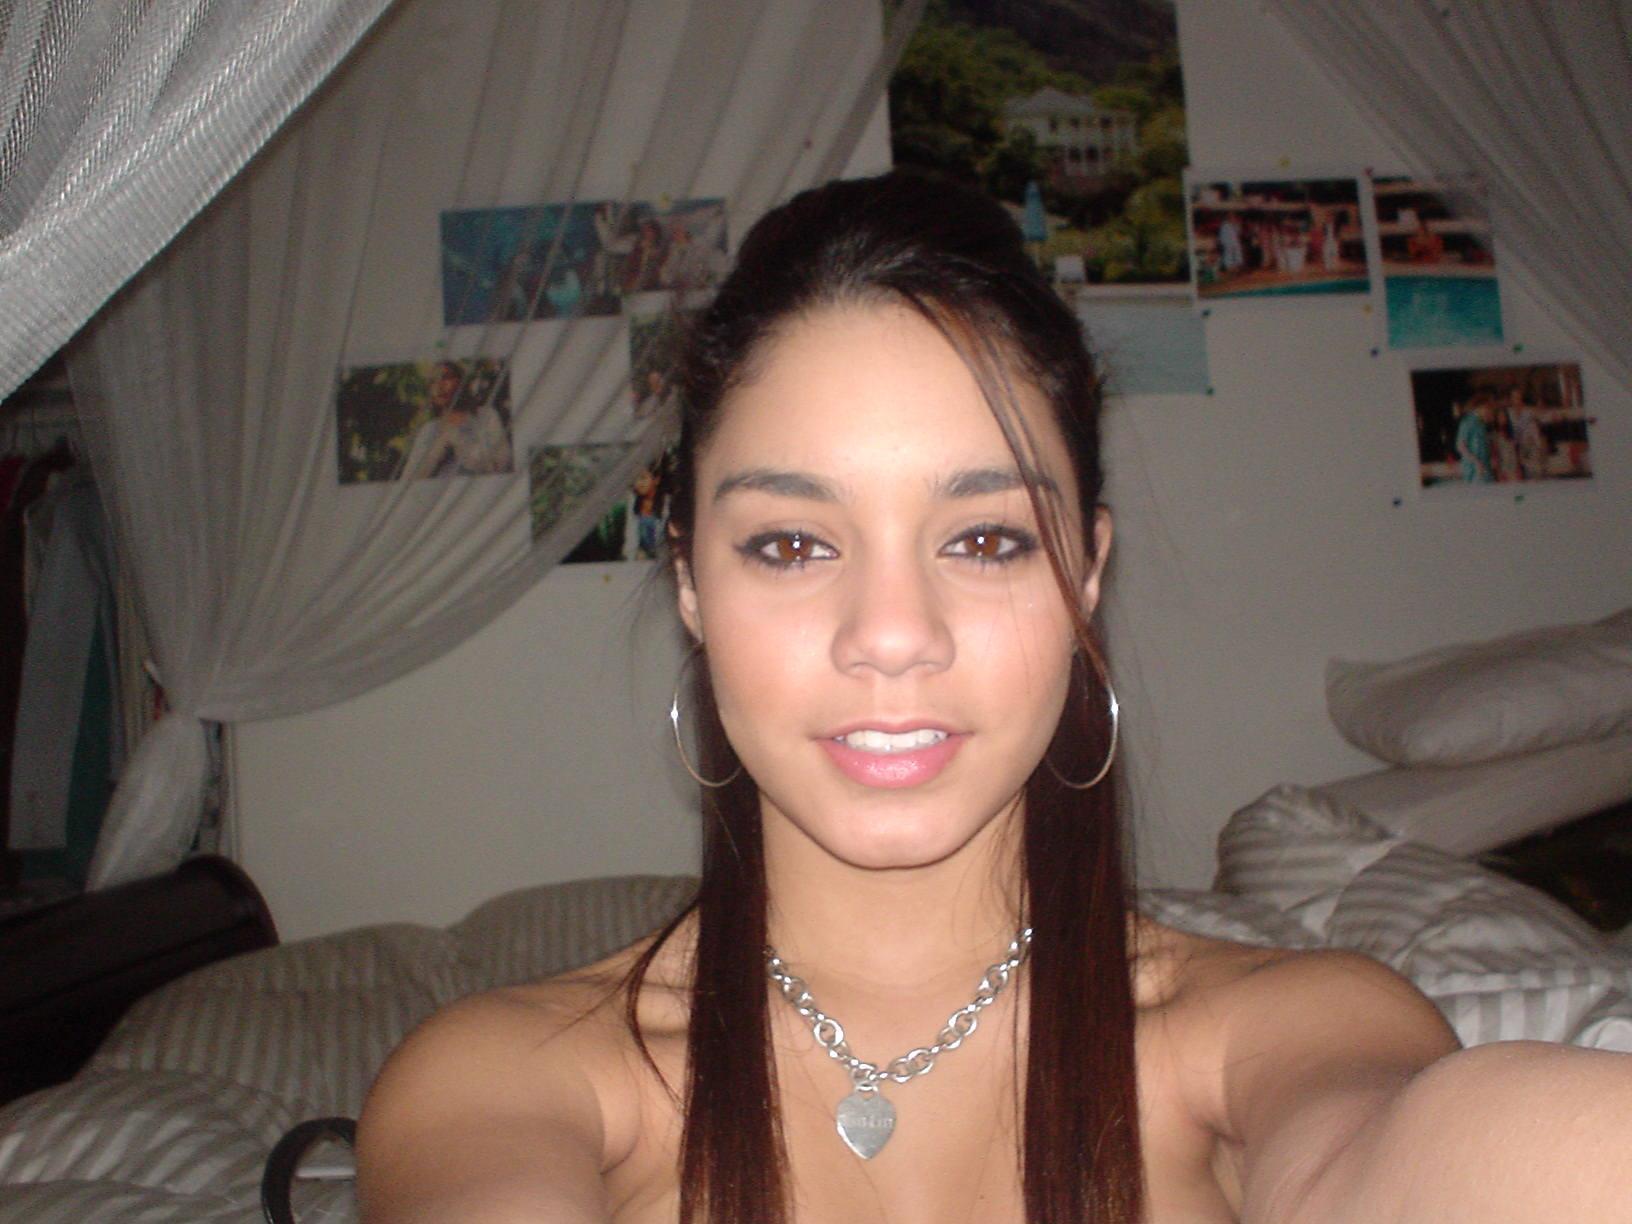 pics of vanessa hudgens naked  659746